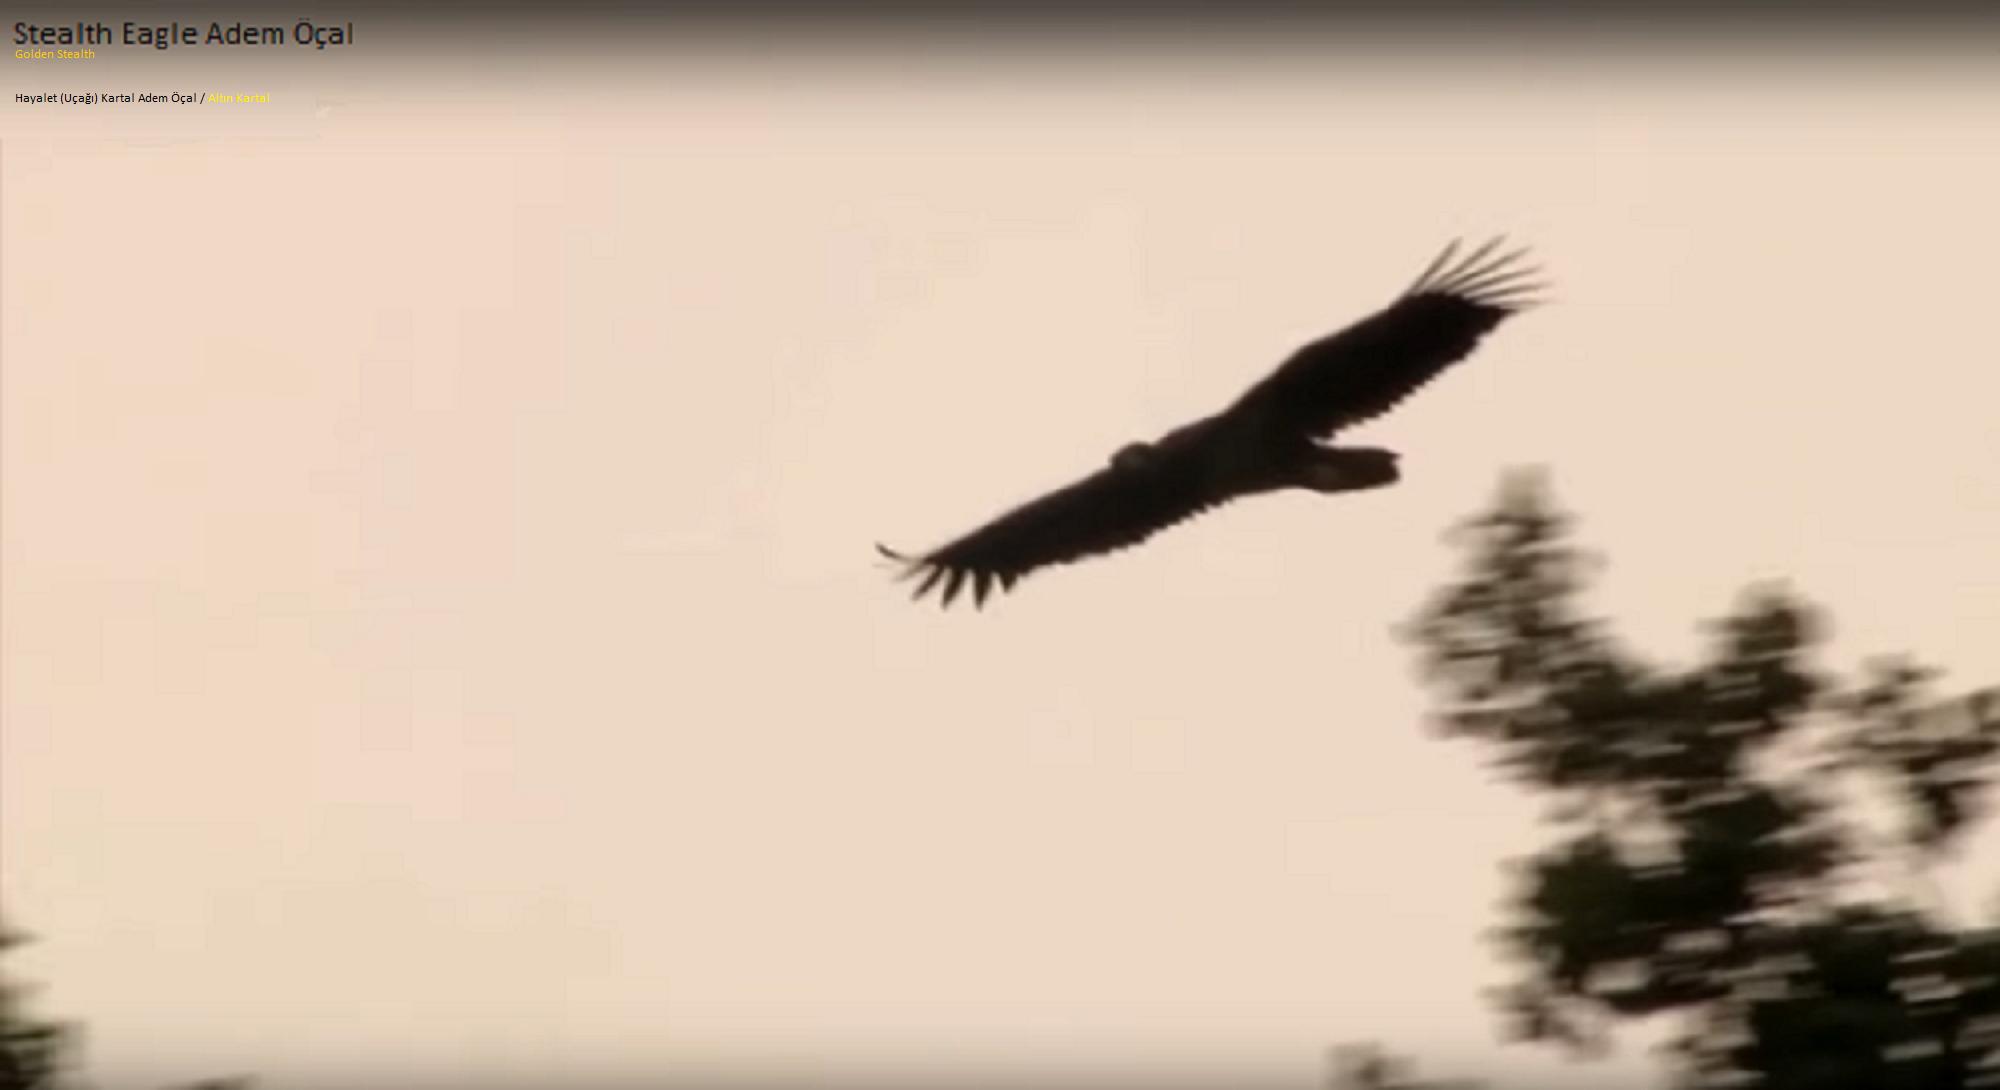 Stealth Eagle Adem Öçal